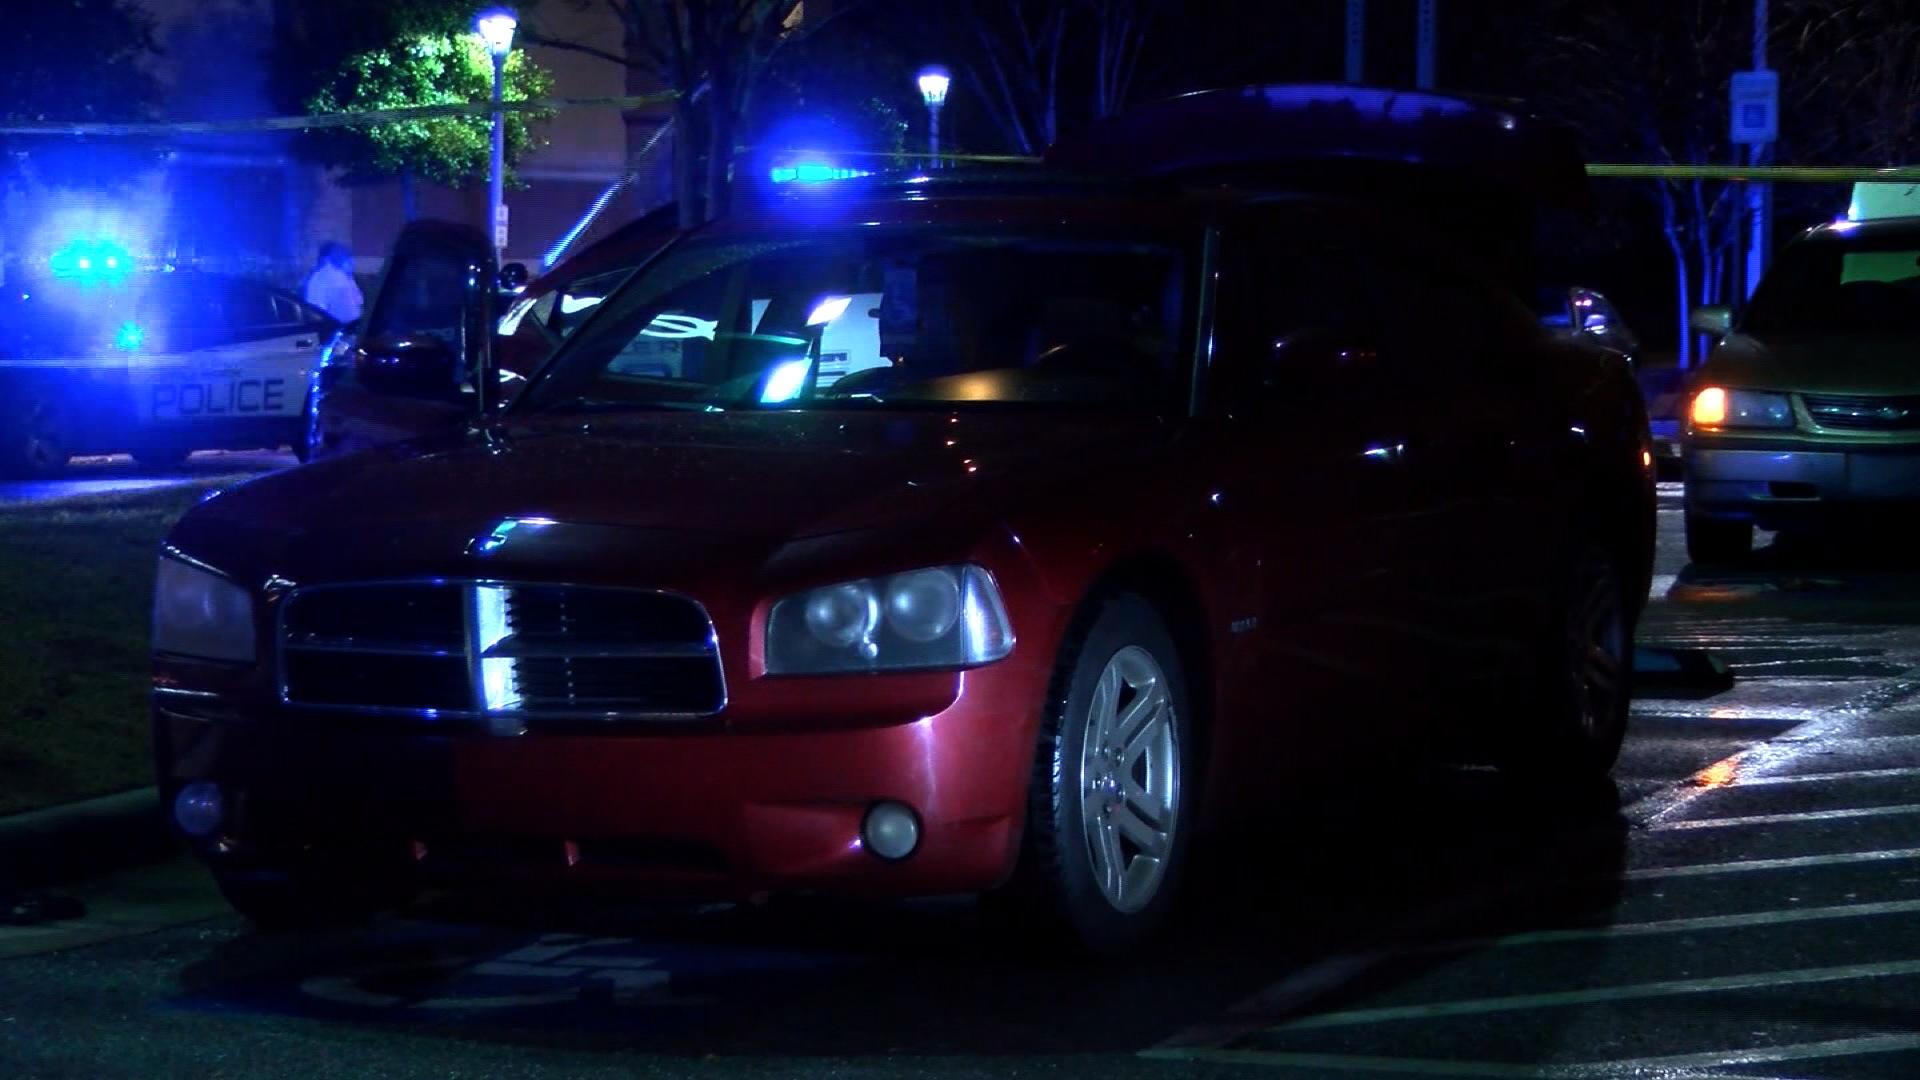 Road-rage incident caught on camera - CNN Video